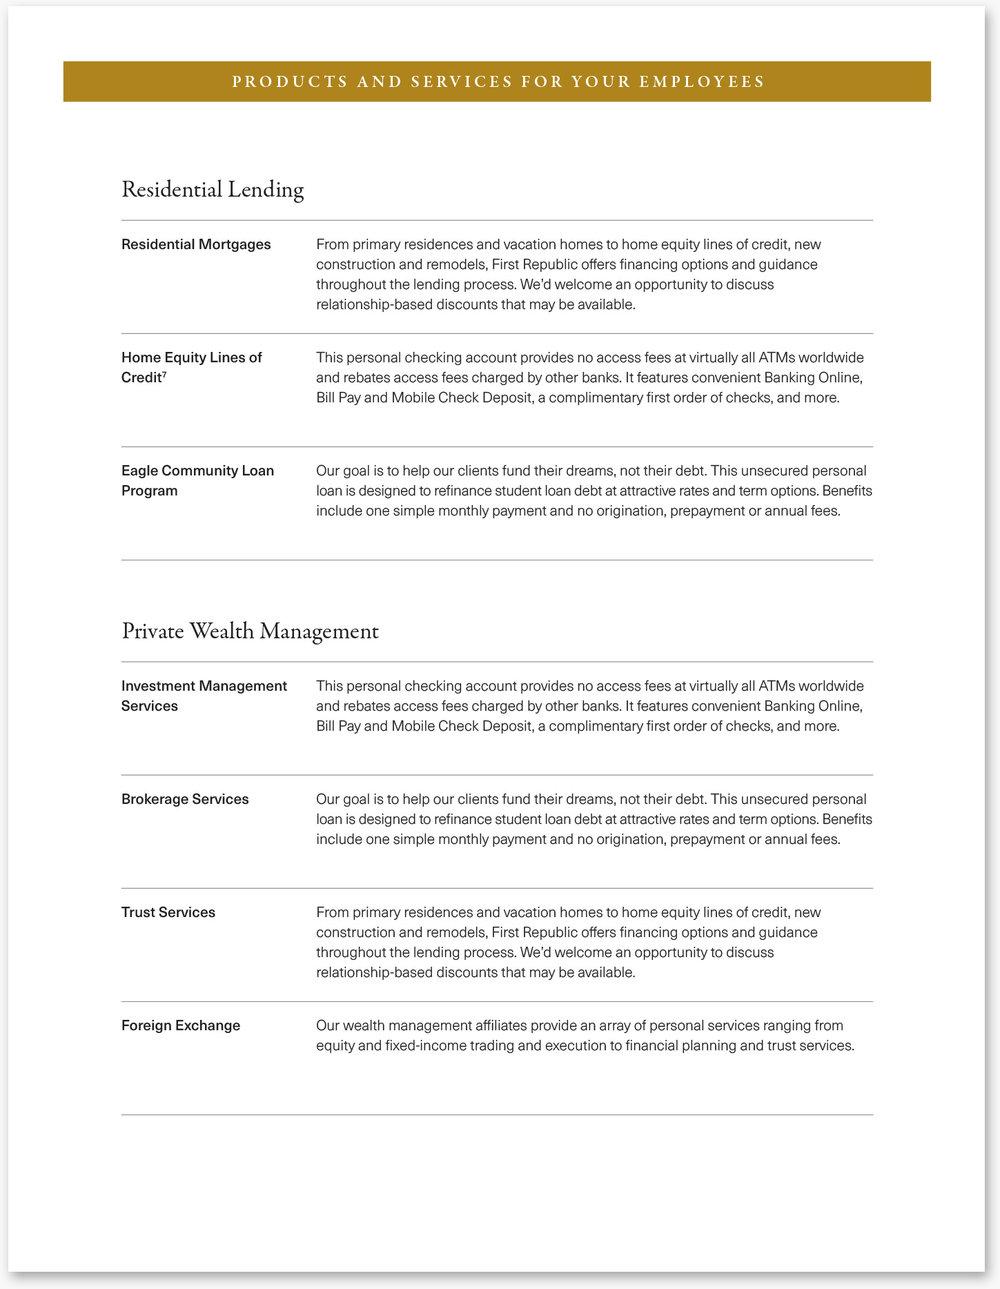 b2b_brochure_9employees_products.jpg